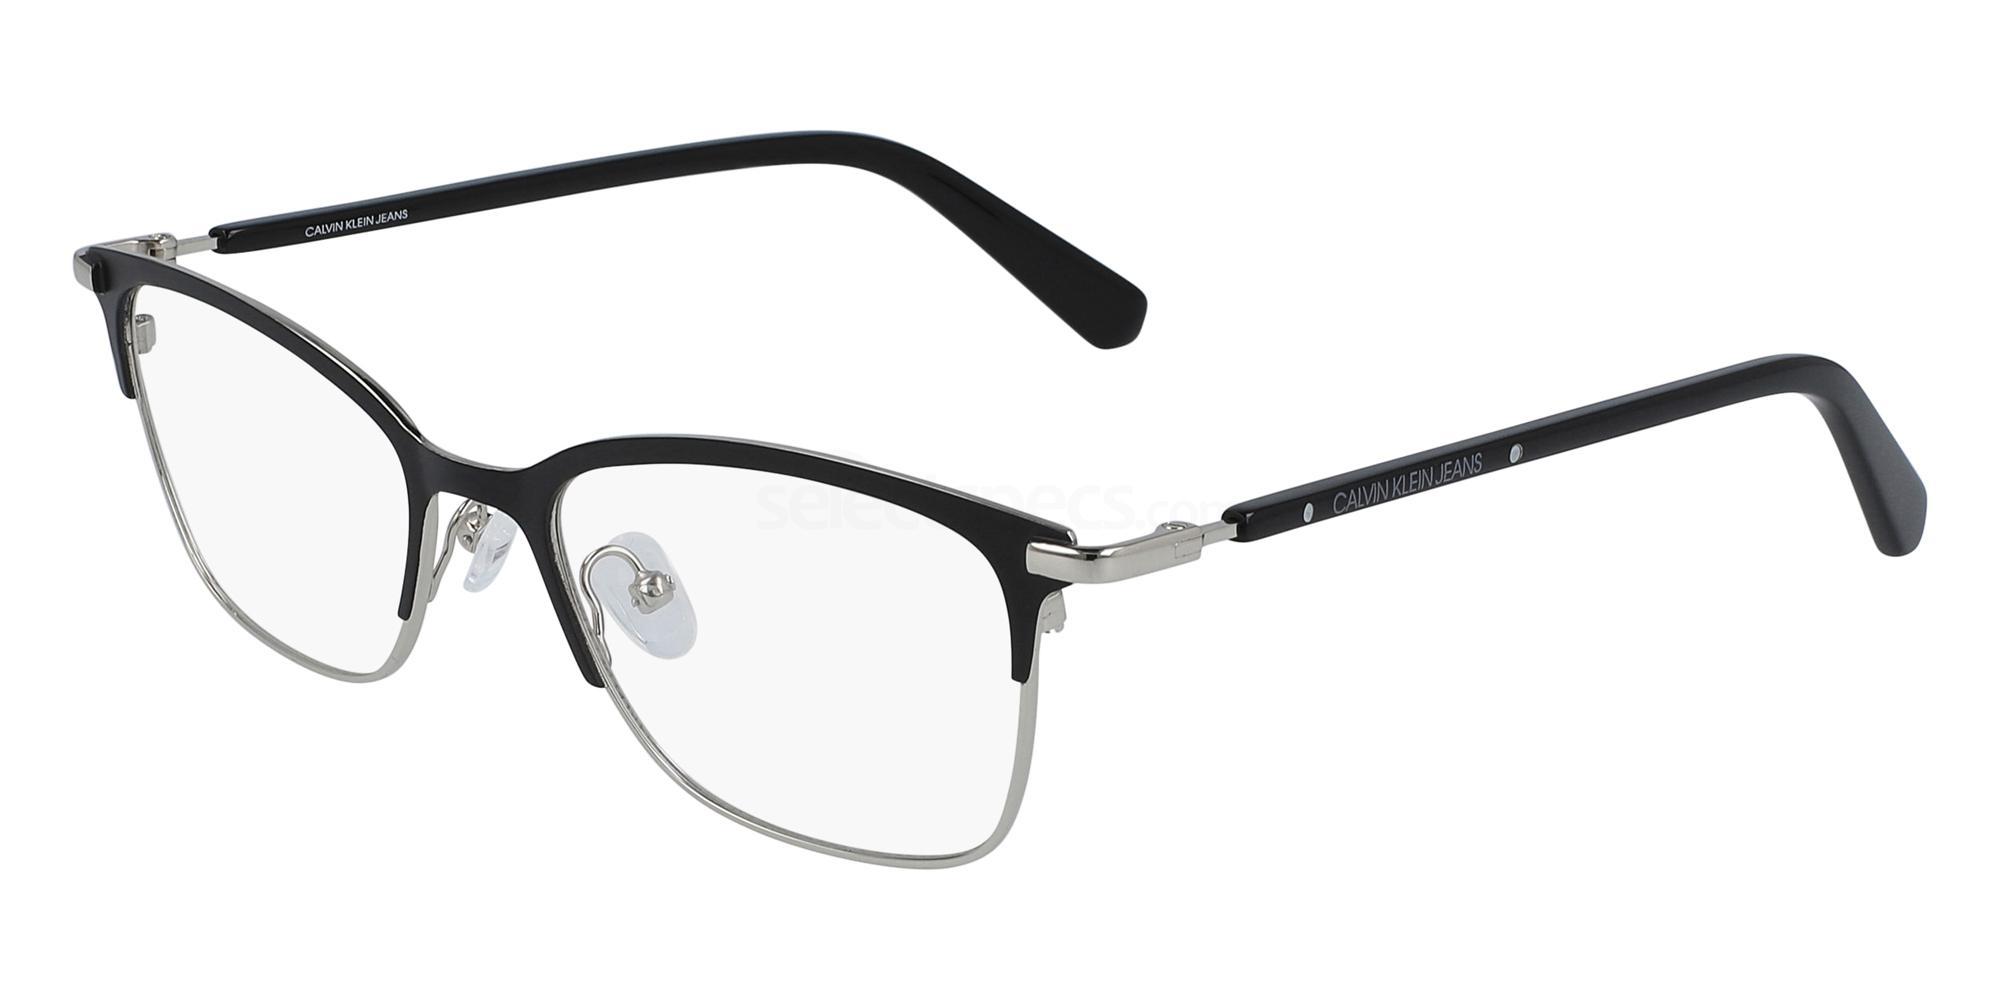 001 CKJ19312 Glasses, Calvin Klein Jeans